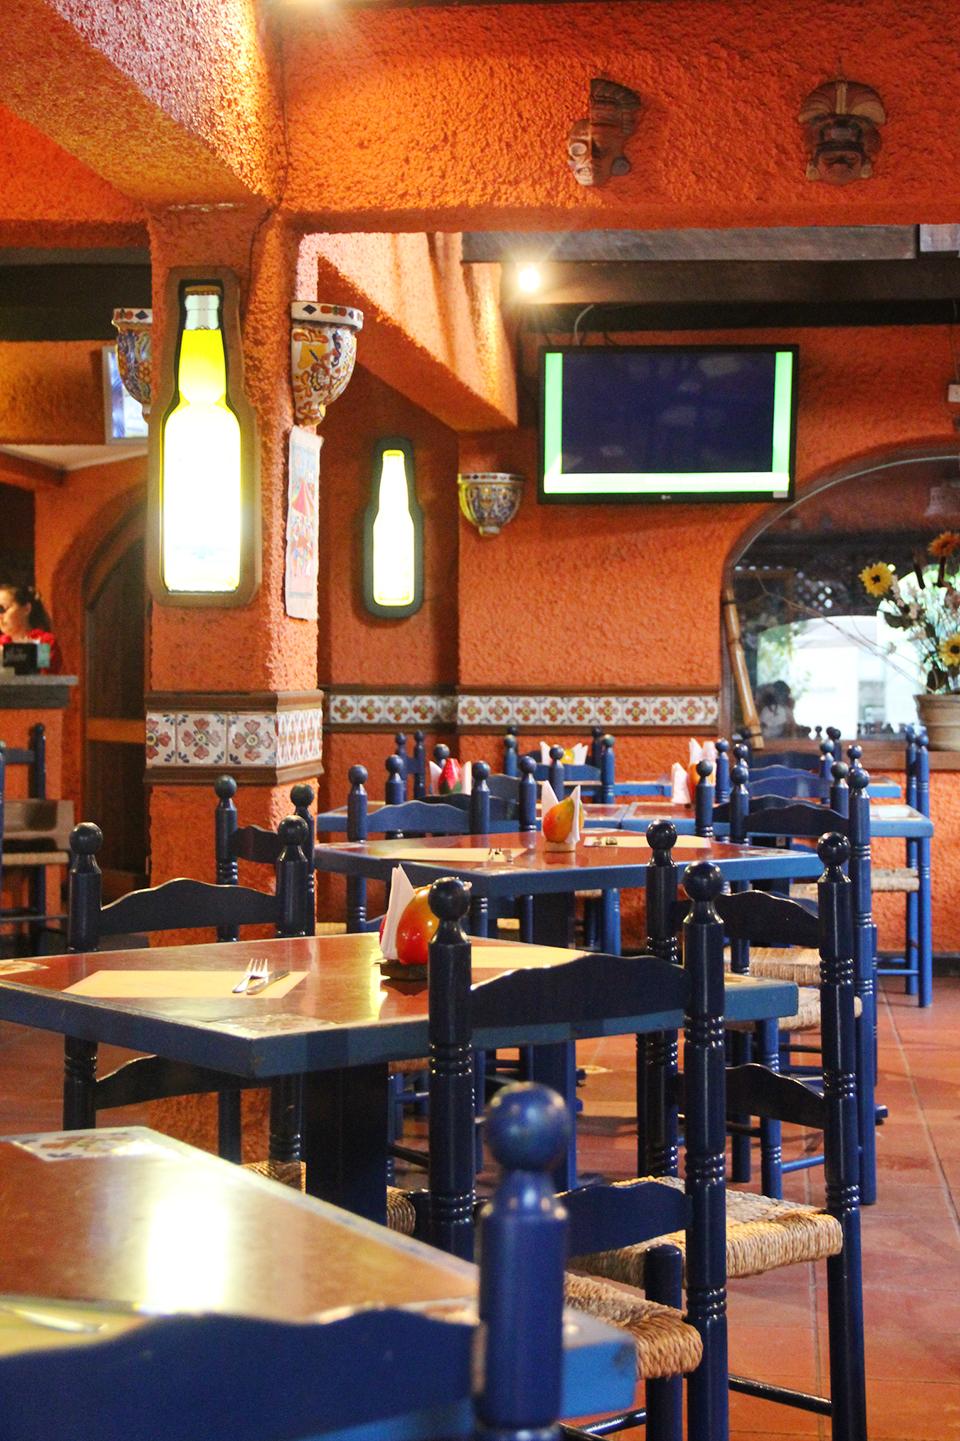 taqueria-el-ranchero-santiago-vitacura-comida-mexicana-chile-foodie-zomato